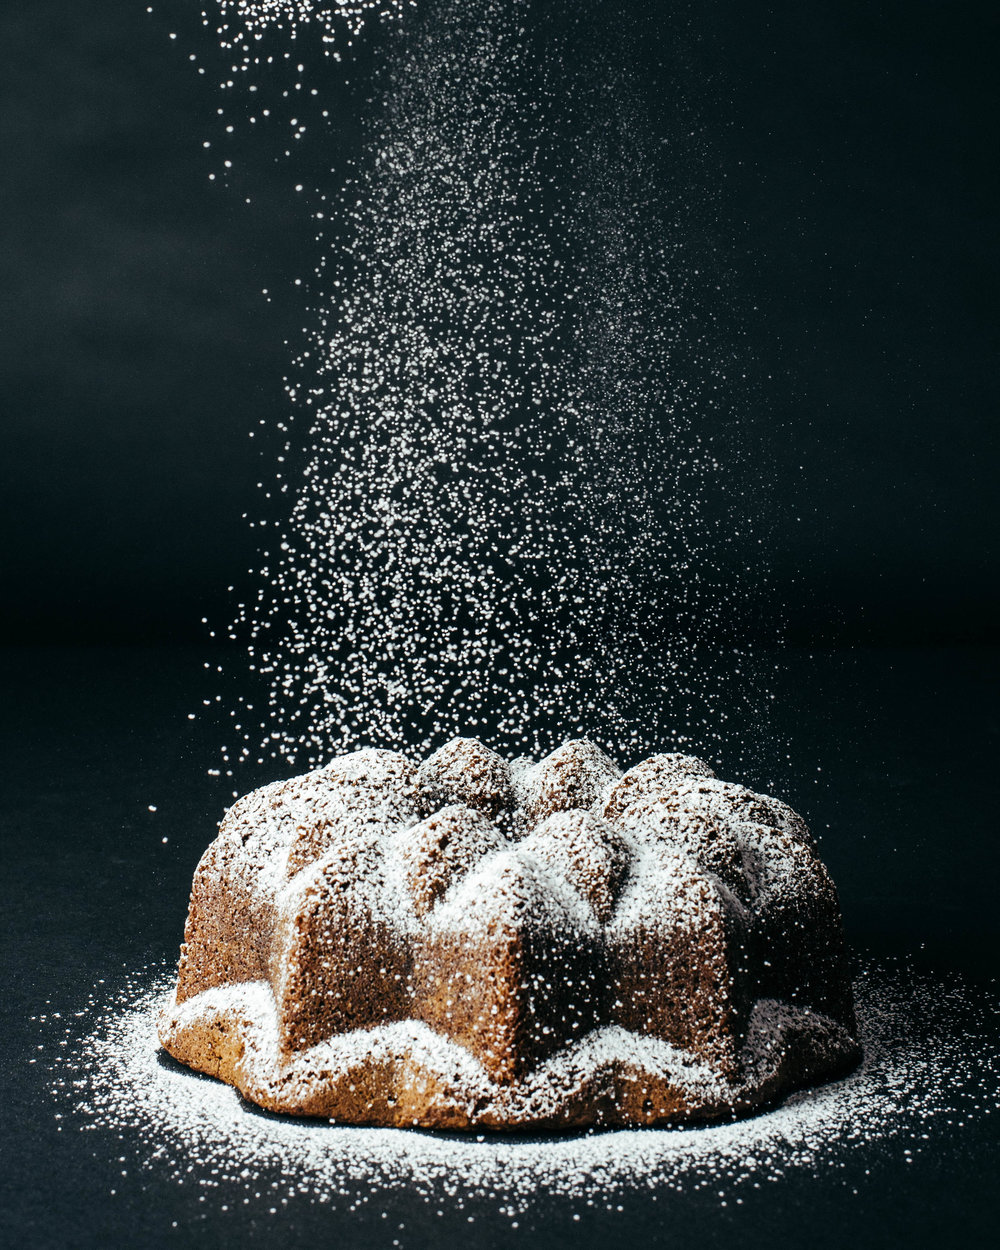 cake-006 copy.jpg